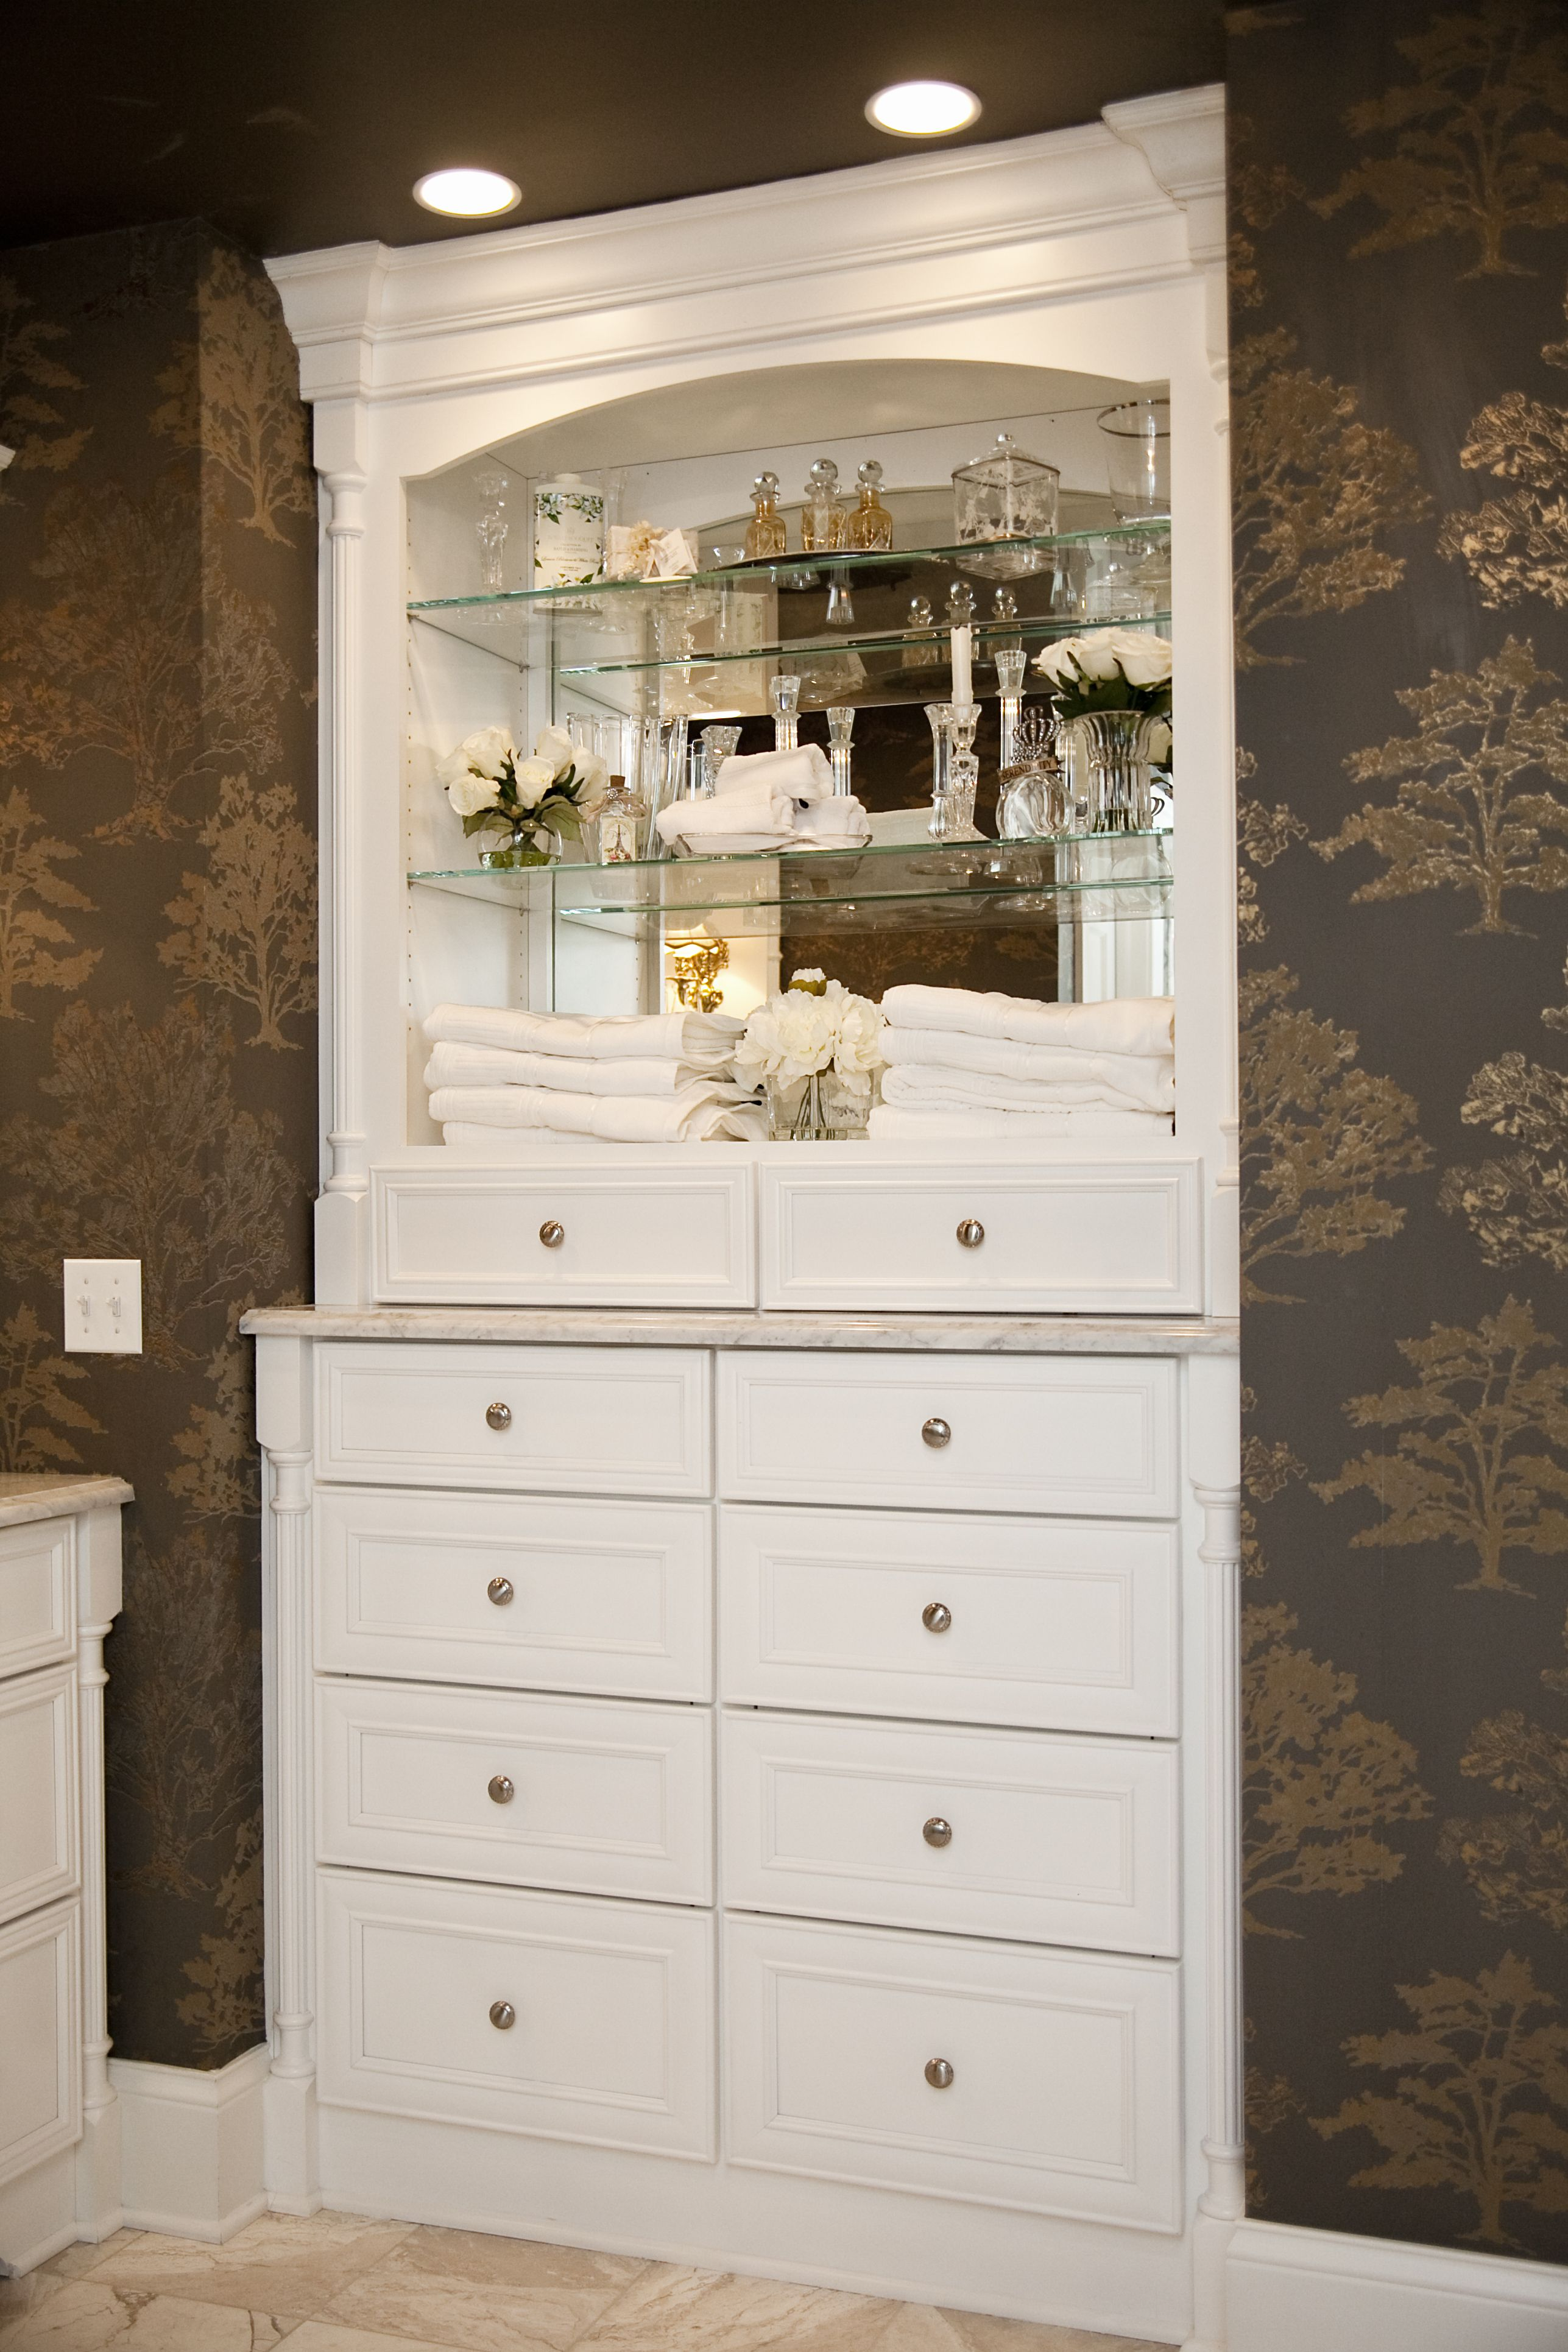 Bath Masters Naperville naperville elegance. bathroom hutch and storage shelves. painted